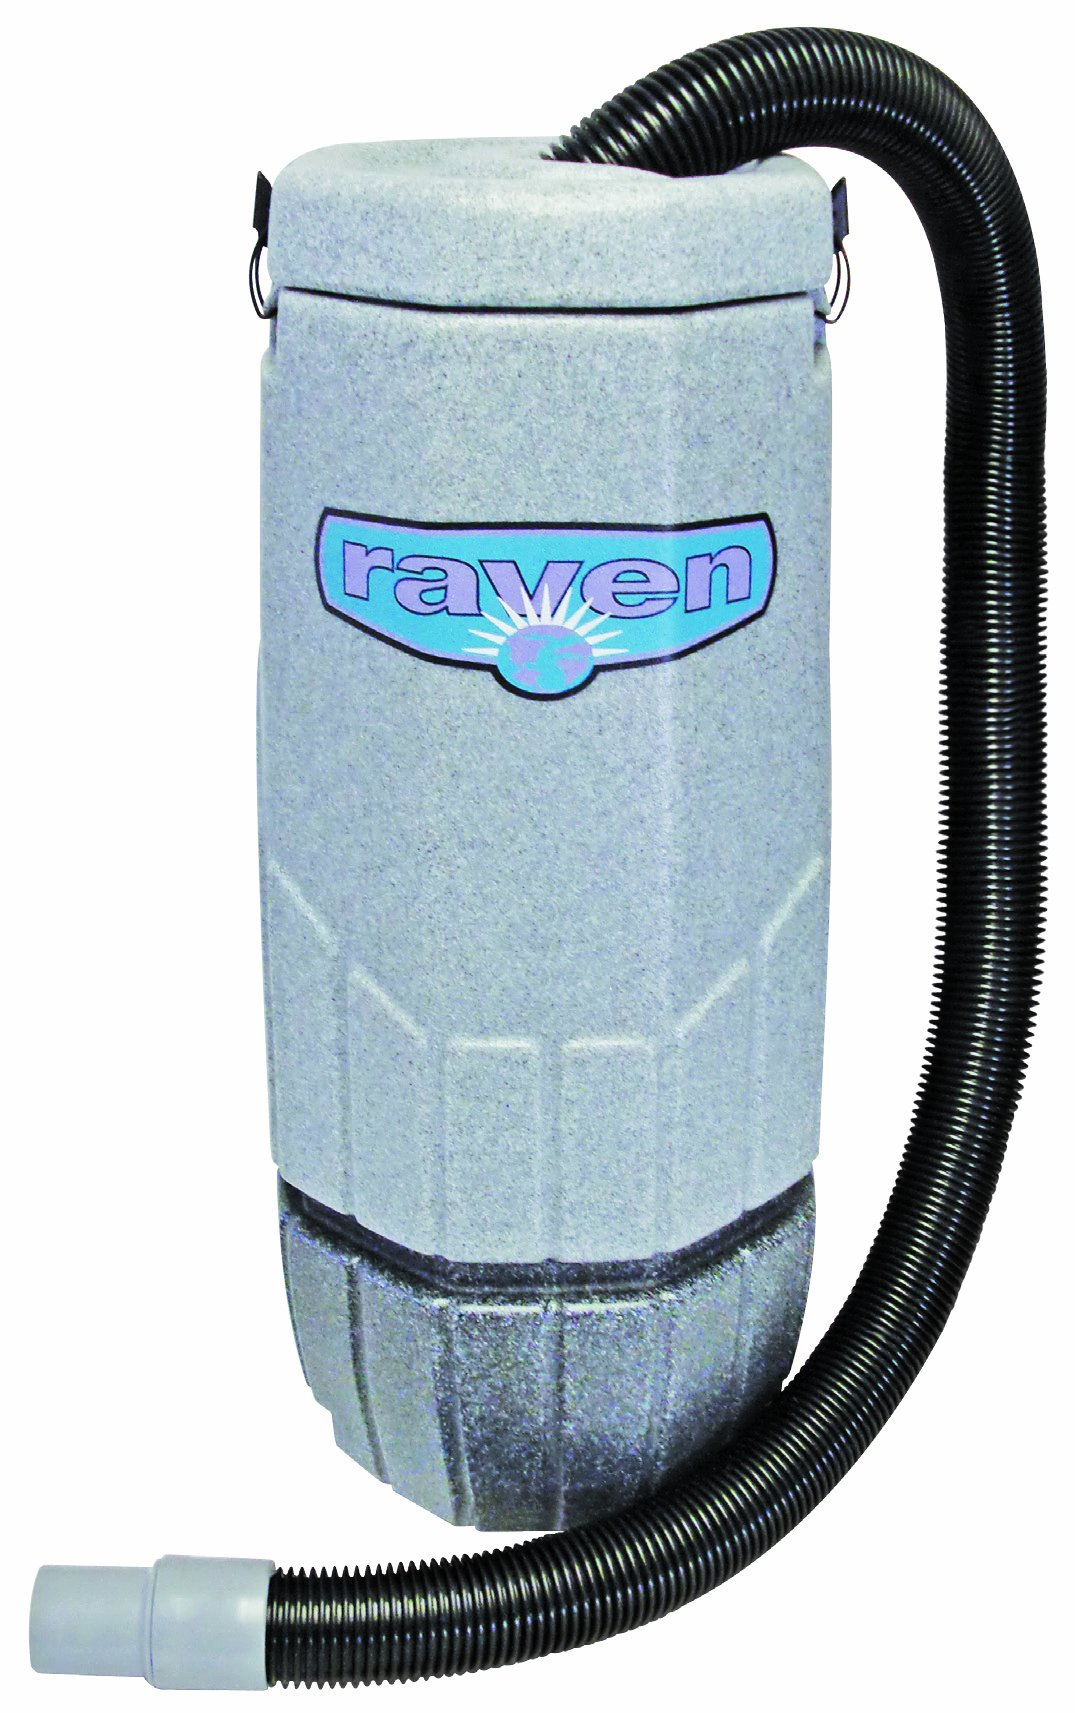 Sandia 20-2000 XP-3 Whisper Raven Commercial Backpack Vacuum, 10 Quart Capacity